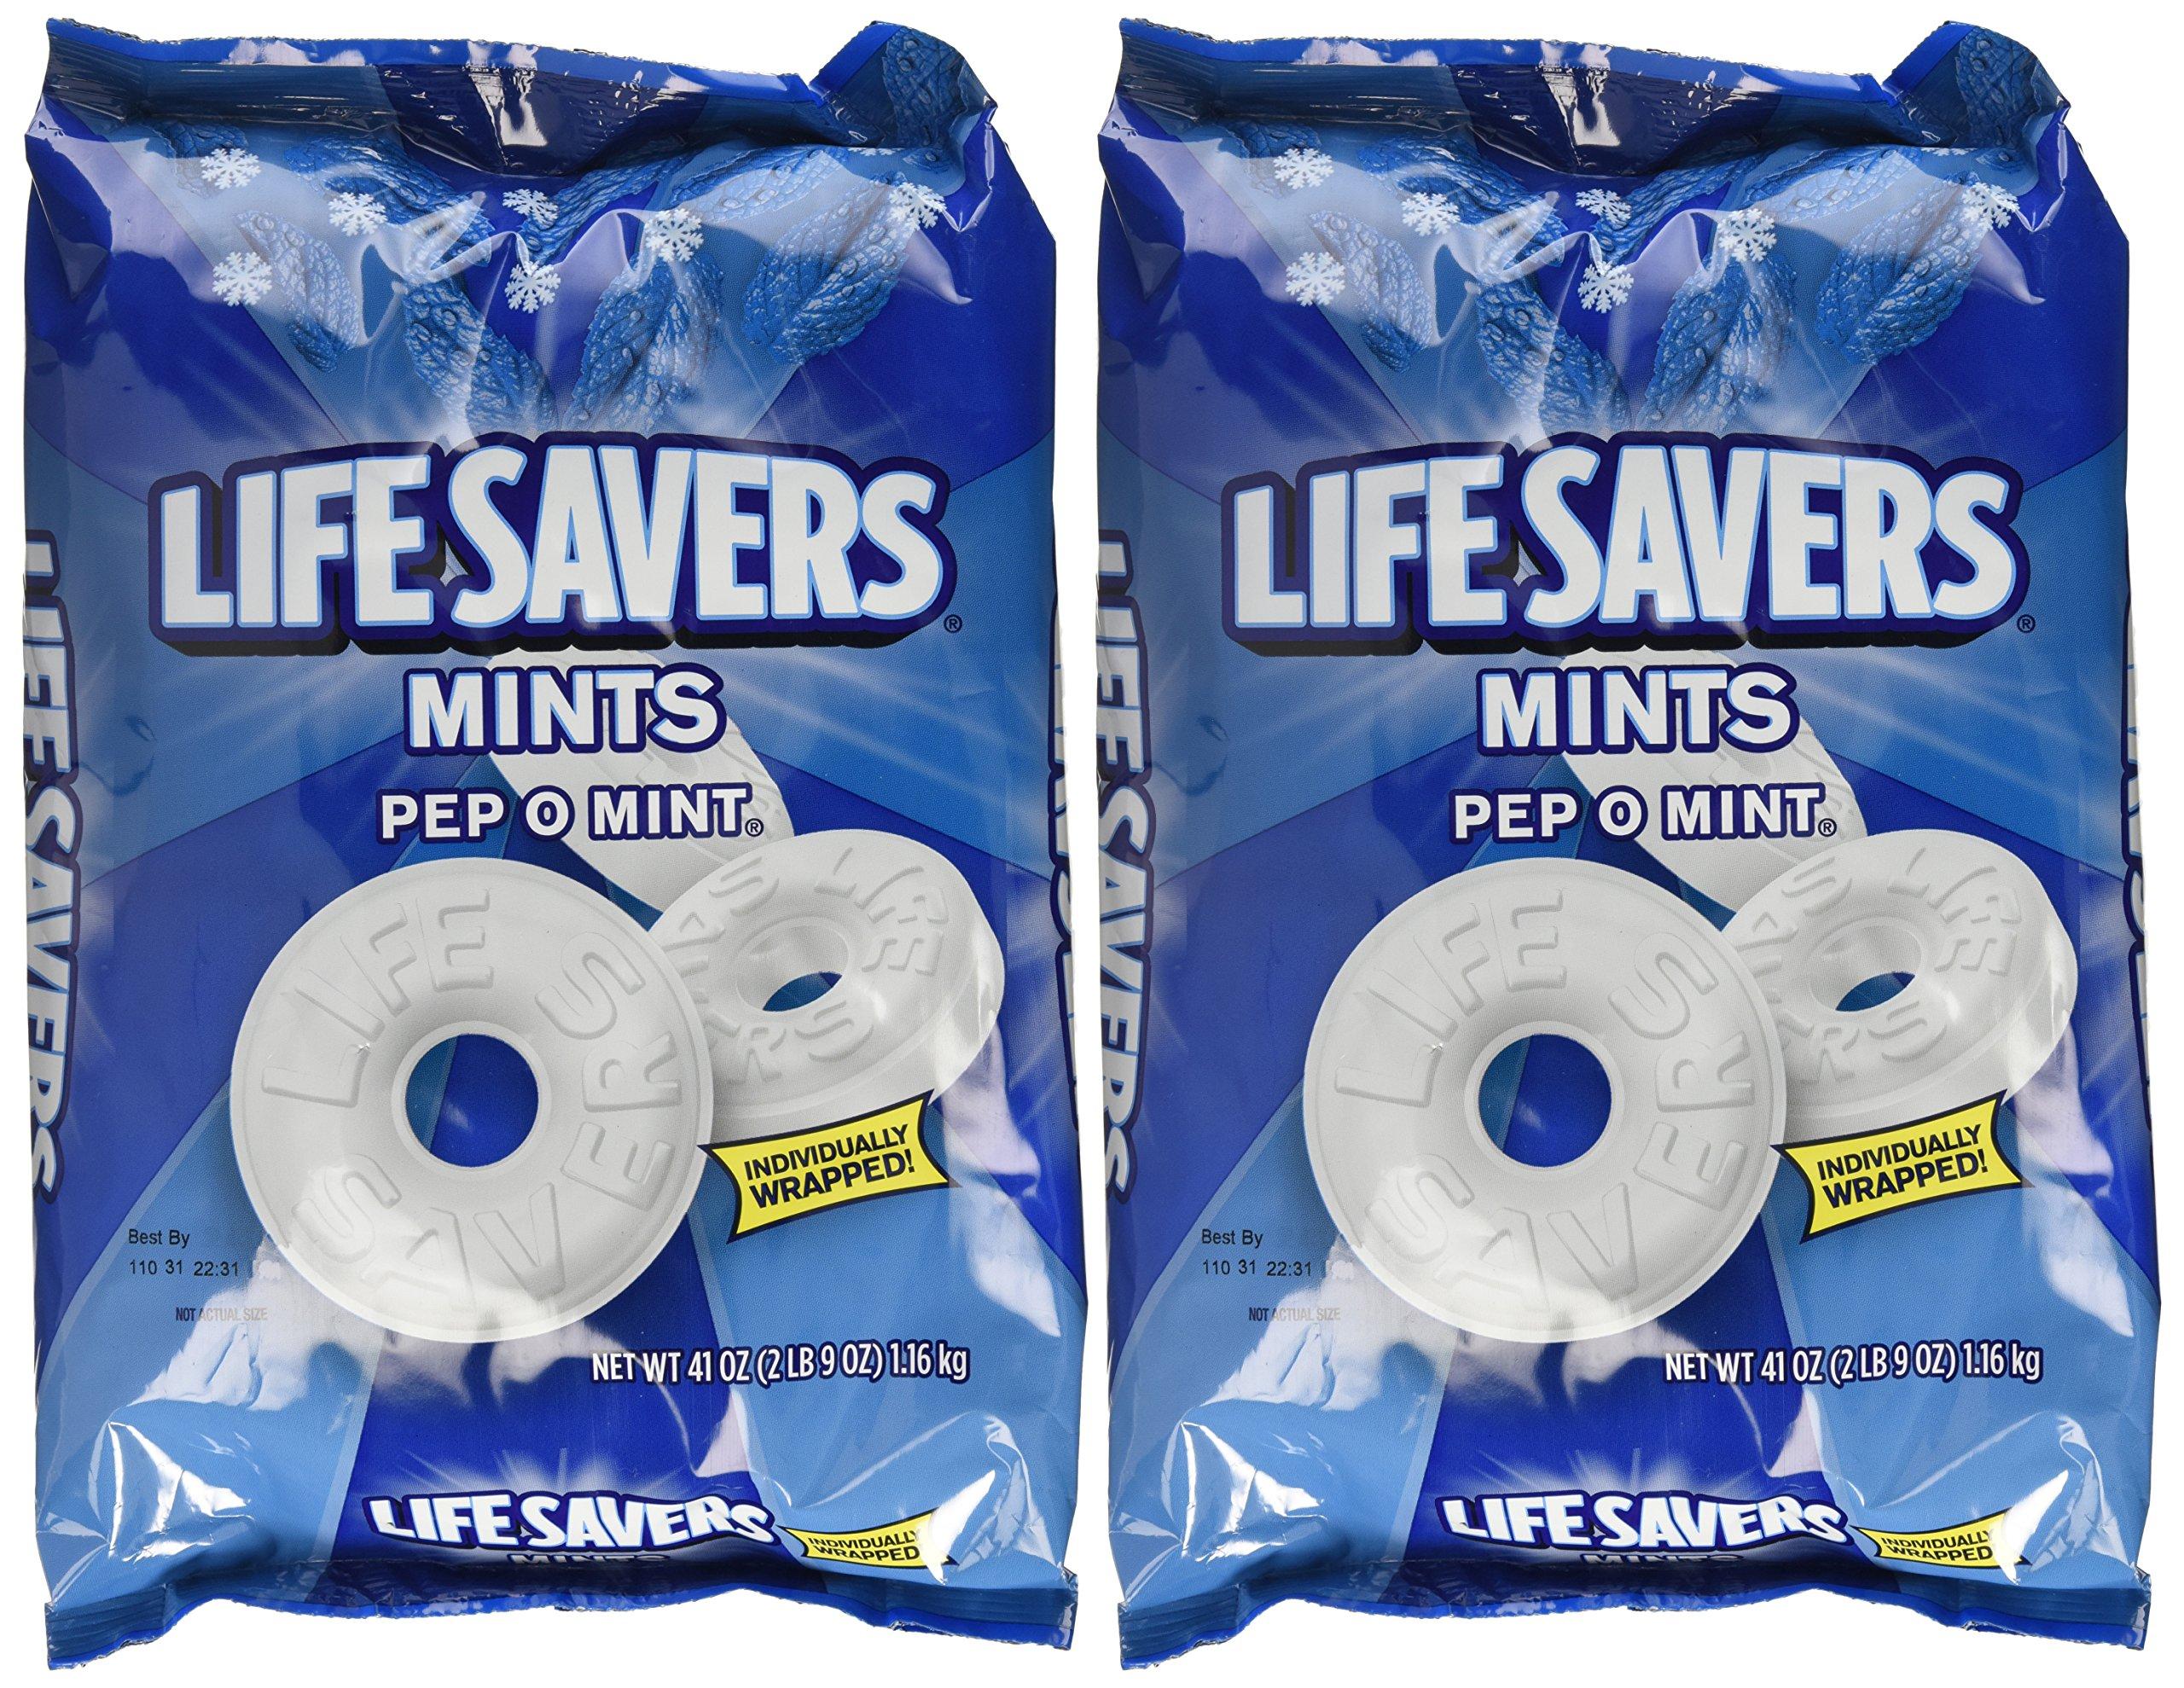 Life Savers, Pep-O-Mint Hard Candy, 41oz Bag (Pack of 2)